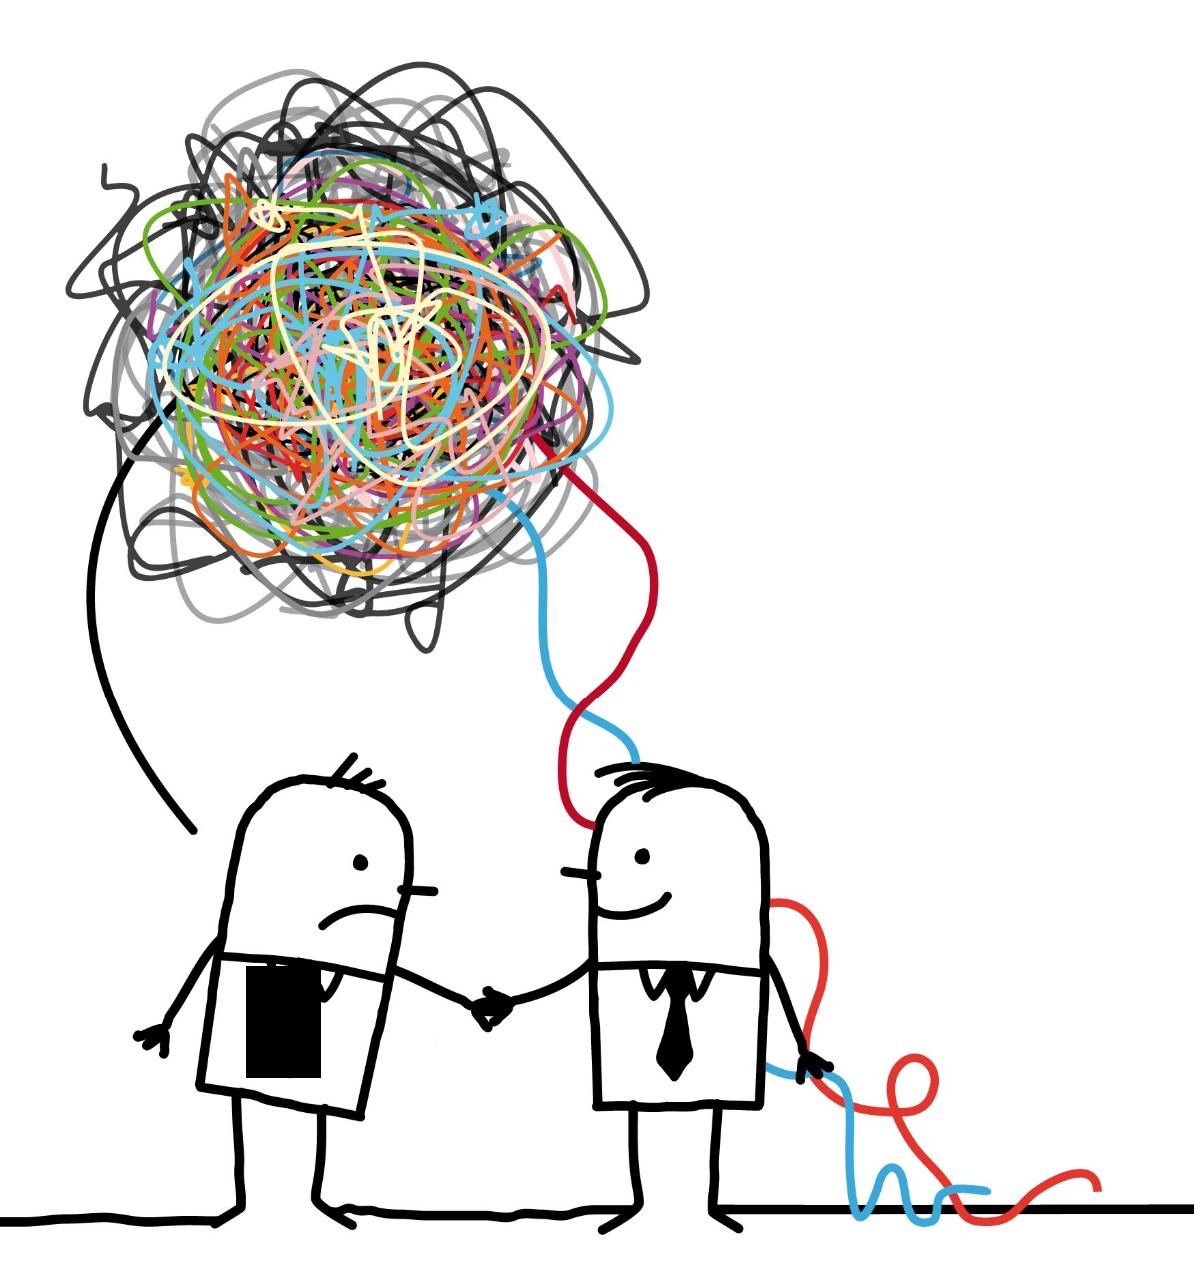 Psicoterapia: Aceita O Desafio?